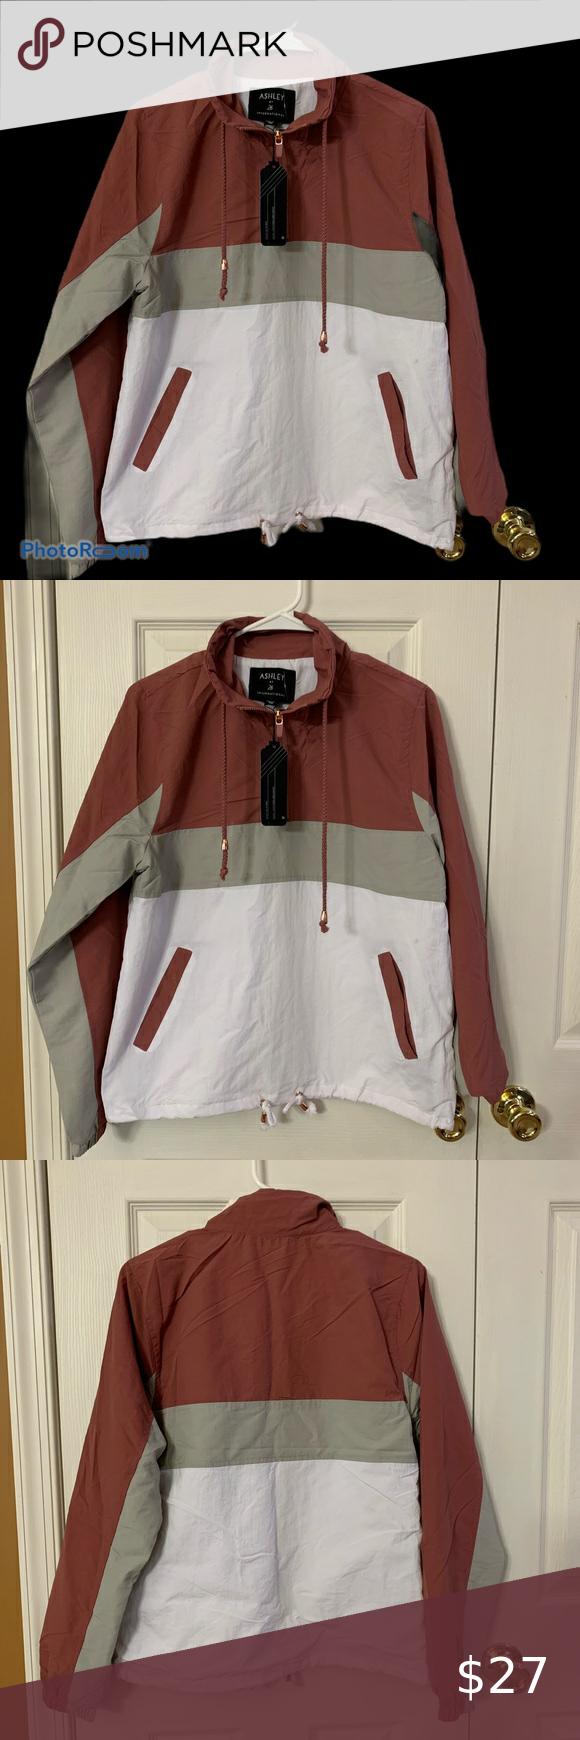 Ashley Outerwear Jacket Pullover Medium Nwt Super Cute Pullover Windbreaker Ashley By 26 International Outerwear Jackets Clothes Design Pullover Windbreaker [ 1740 x 580 Pixel ]